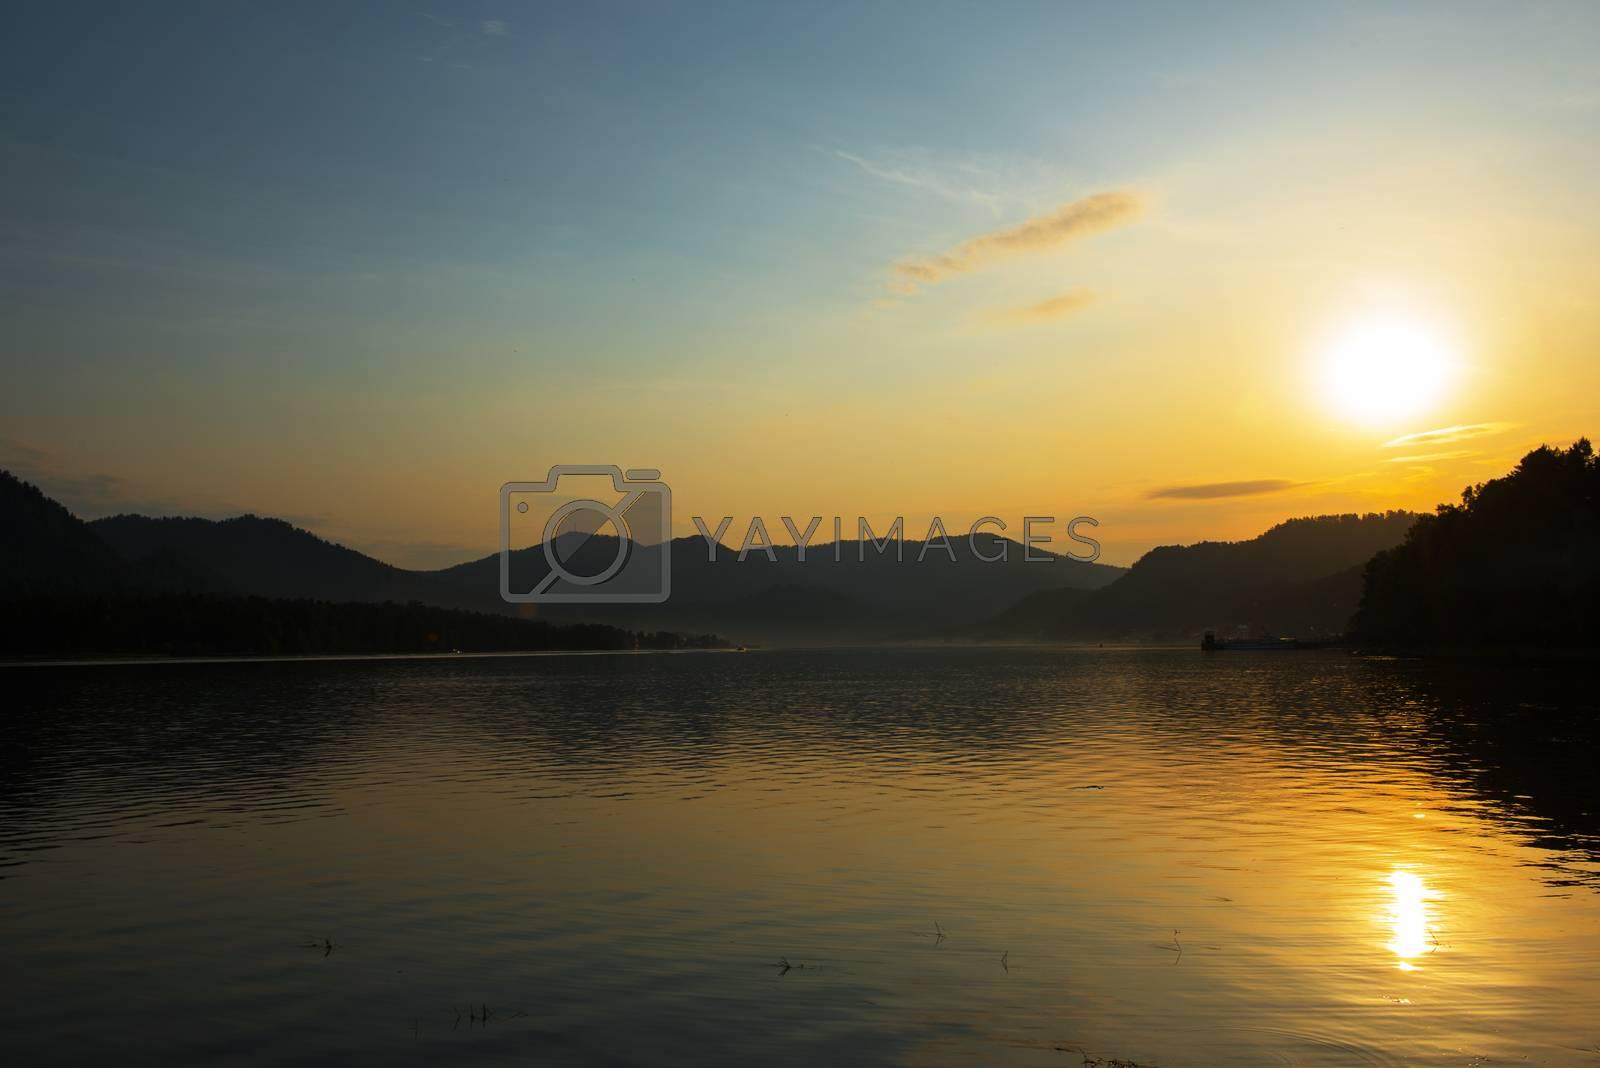 Sunset on Teletskoye lake in Altai mountains, Siberia, Russia. Drone shot.